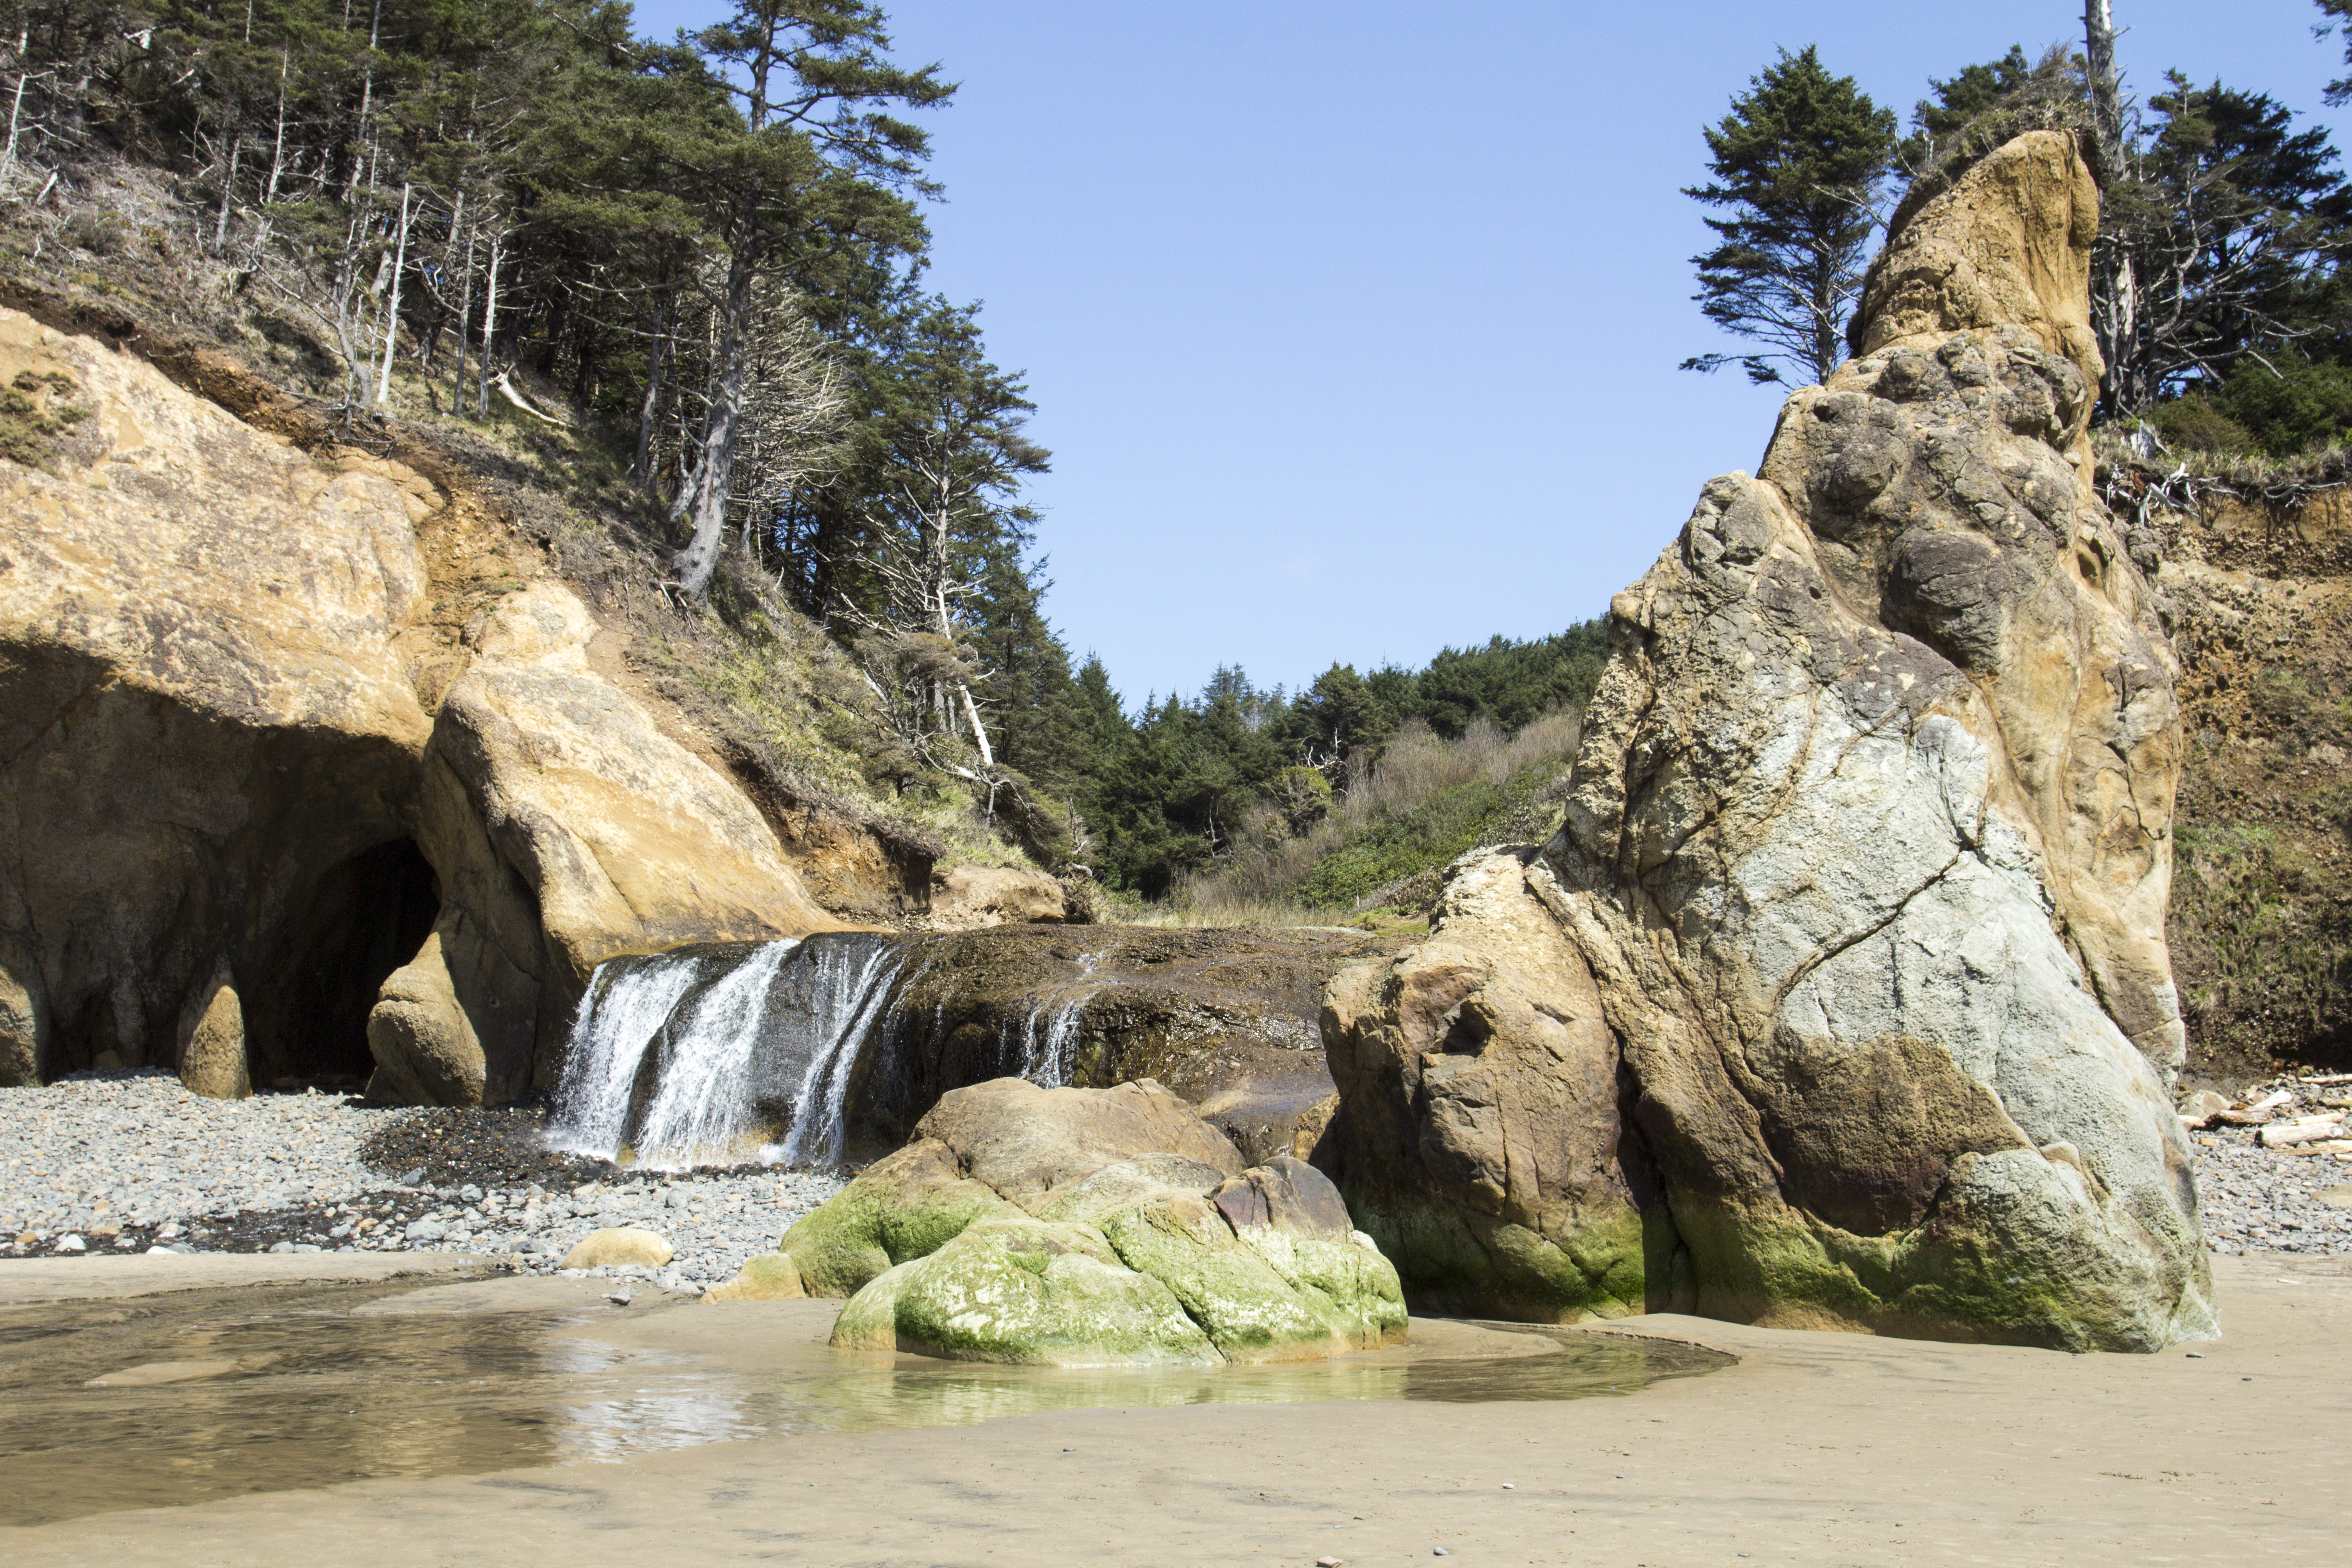 Hug beach waterfall, oregon photo